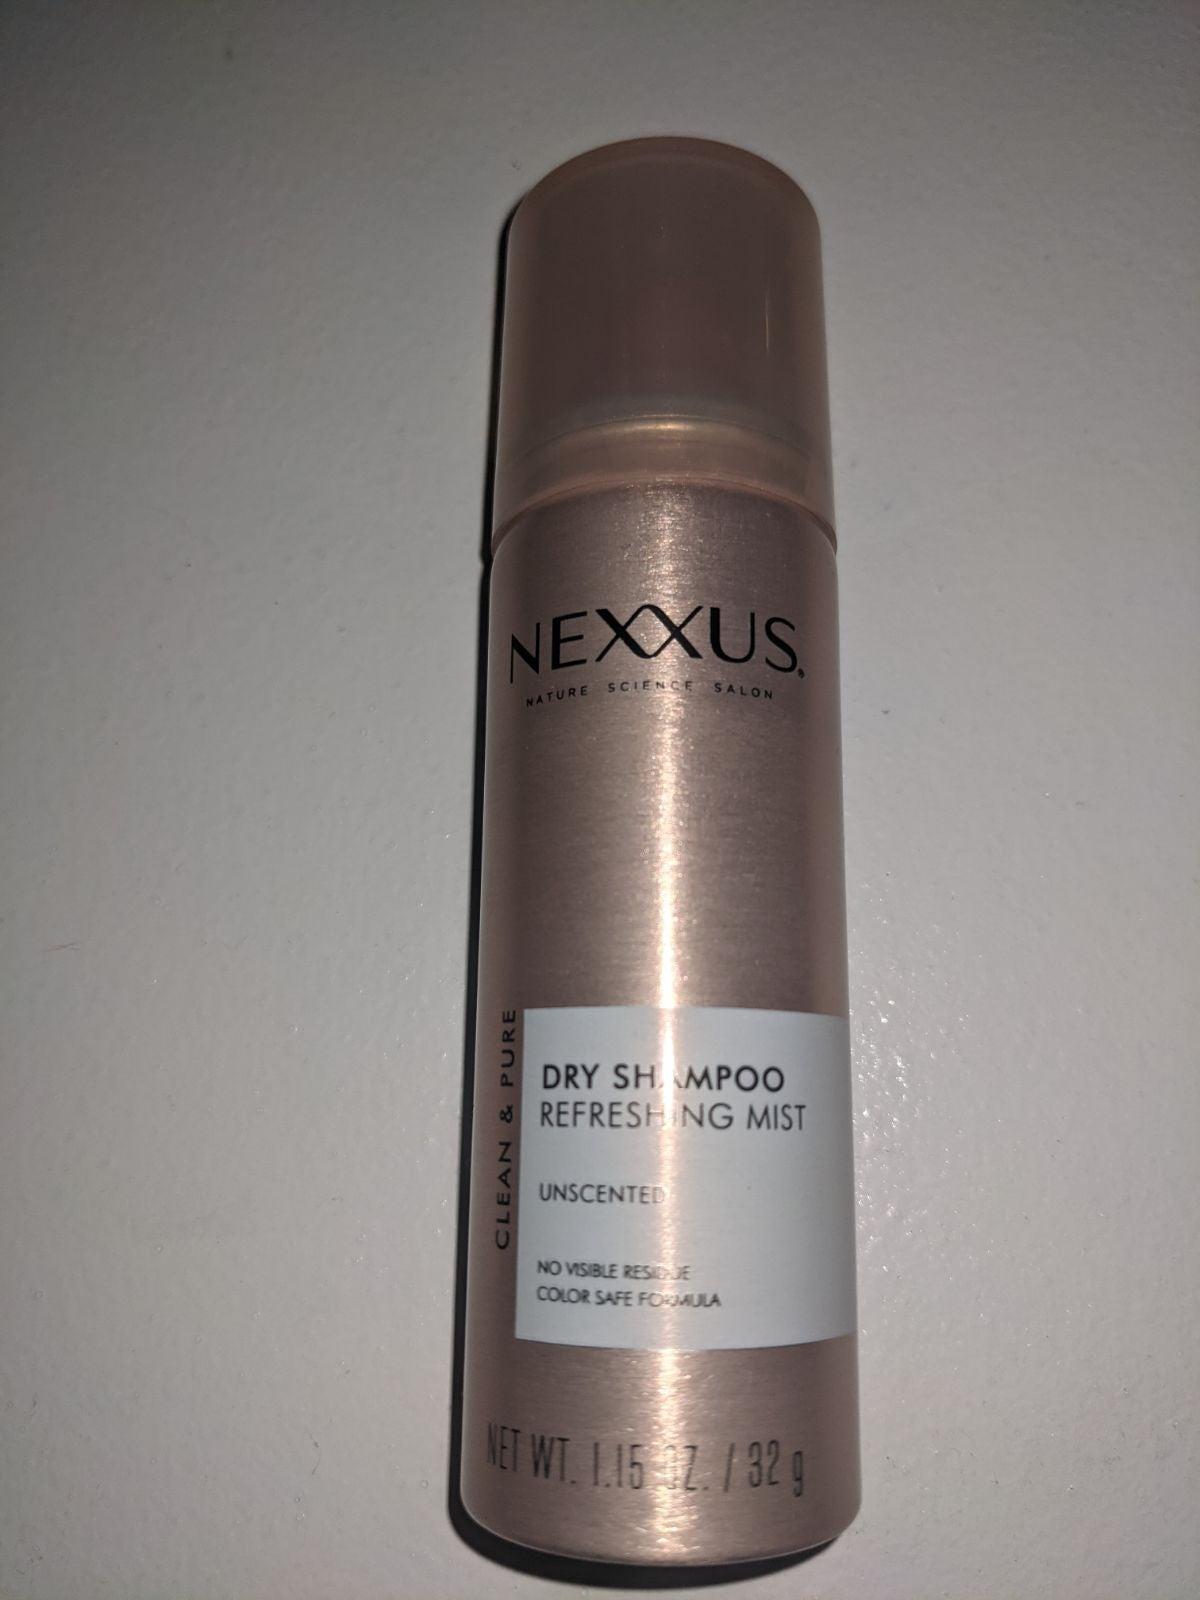 Nexxus Dry Shampoo Refreshing Mist 1.15